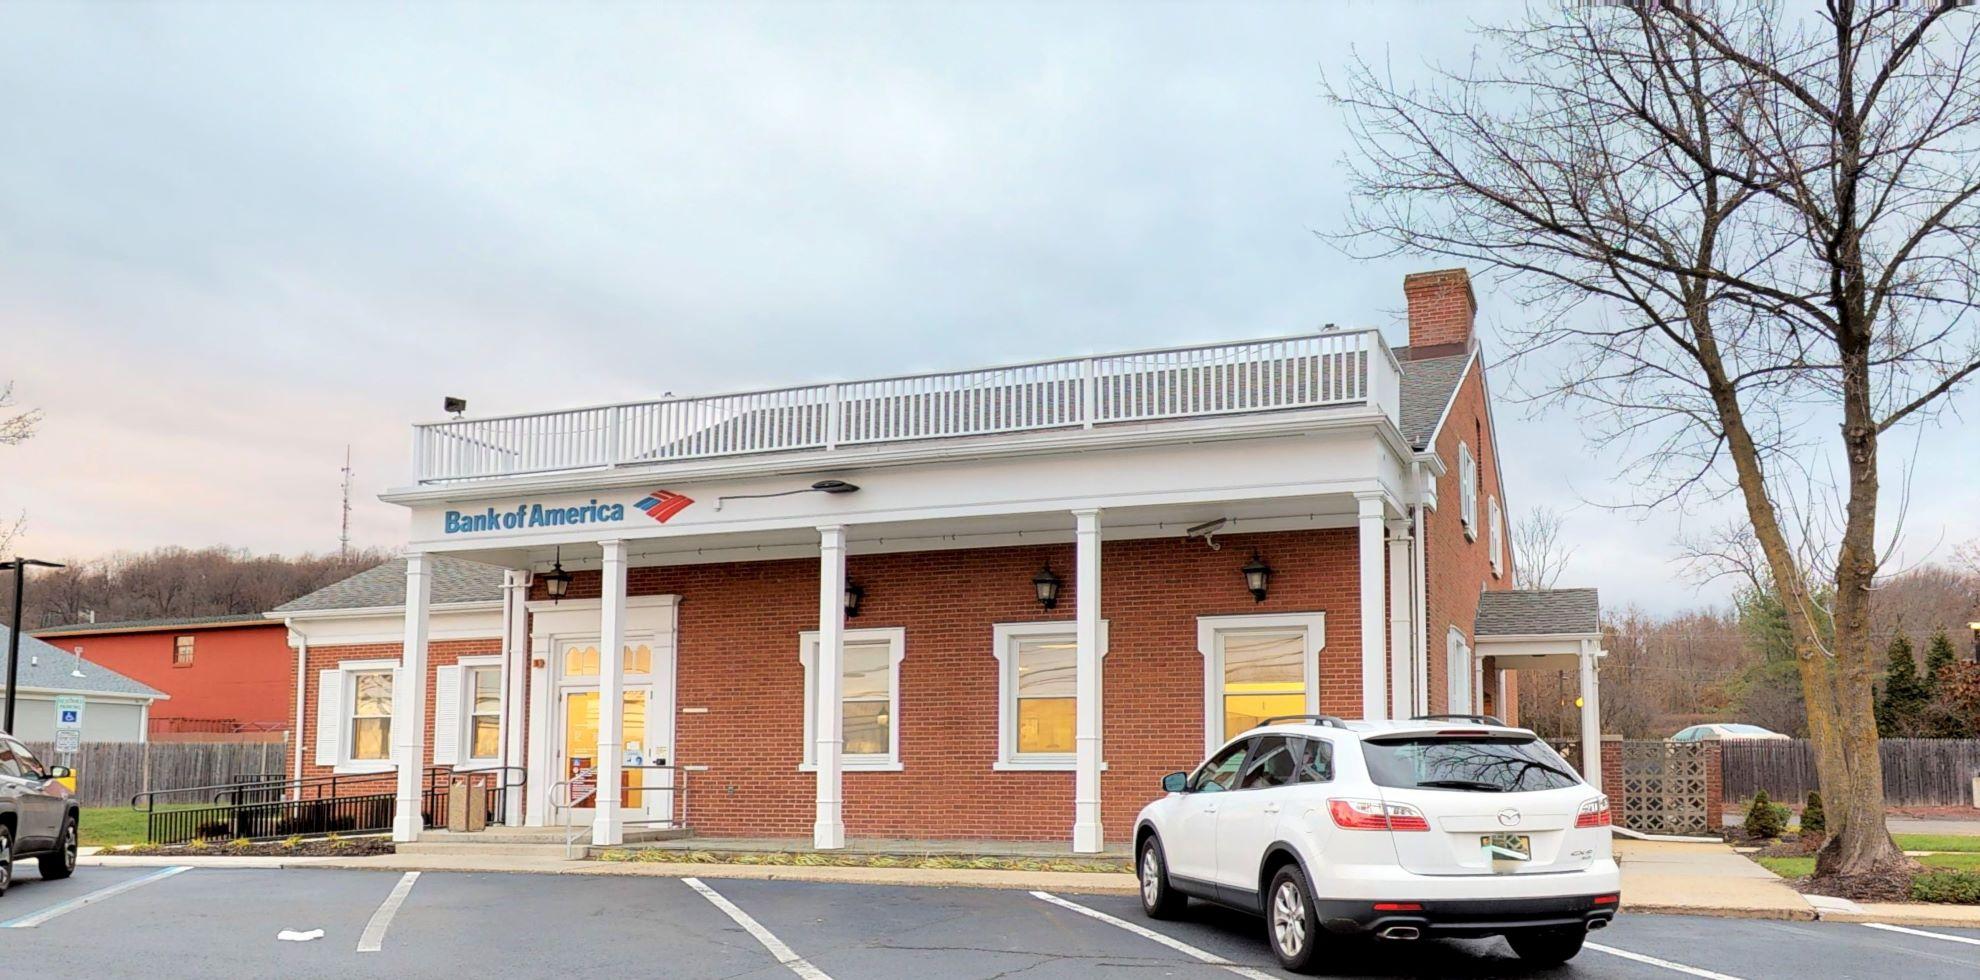 Bank of America financial center with drive-thru ATM | 59 Mountain Blvd, Warren, NJ 07059